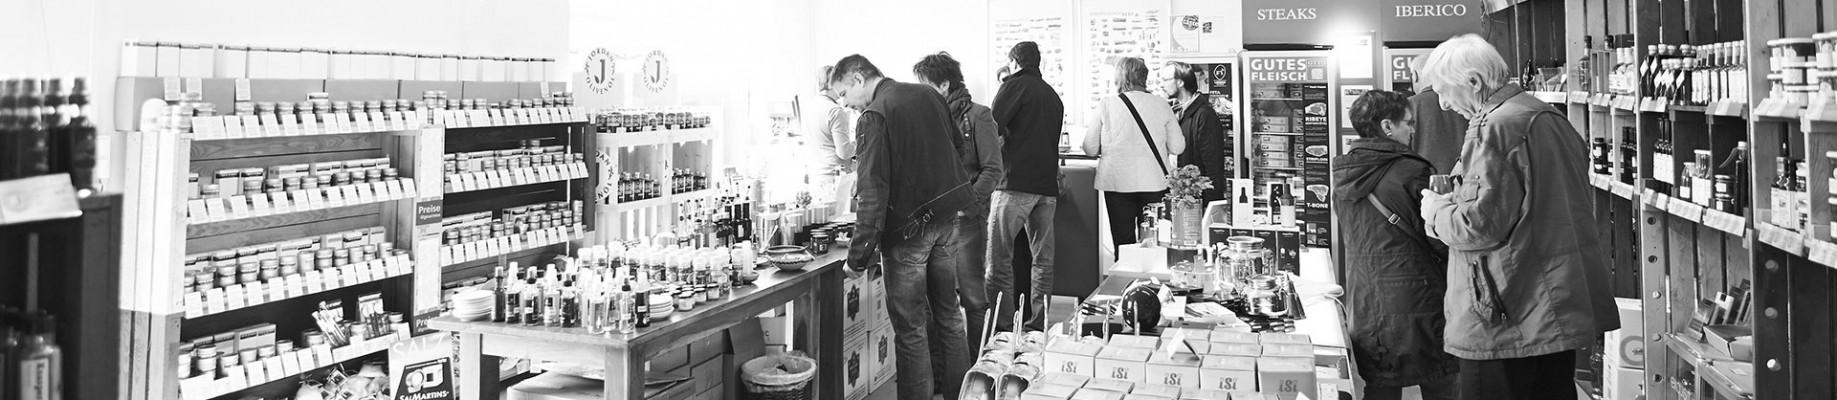 Jordan Olivenöl, Ladenlokal, Solingen